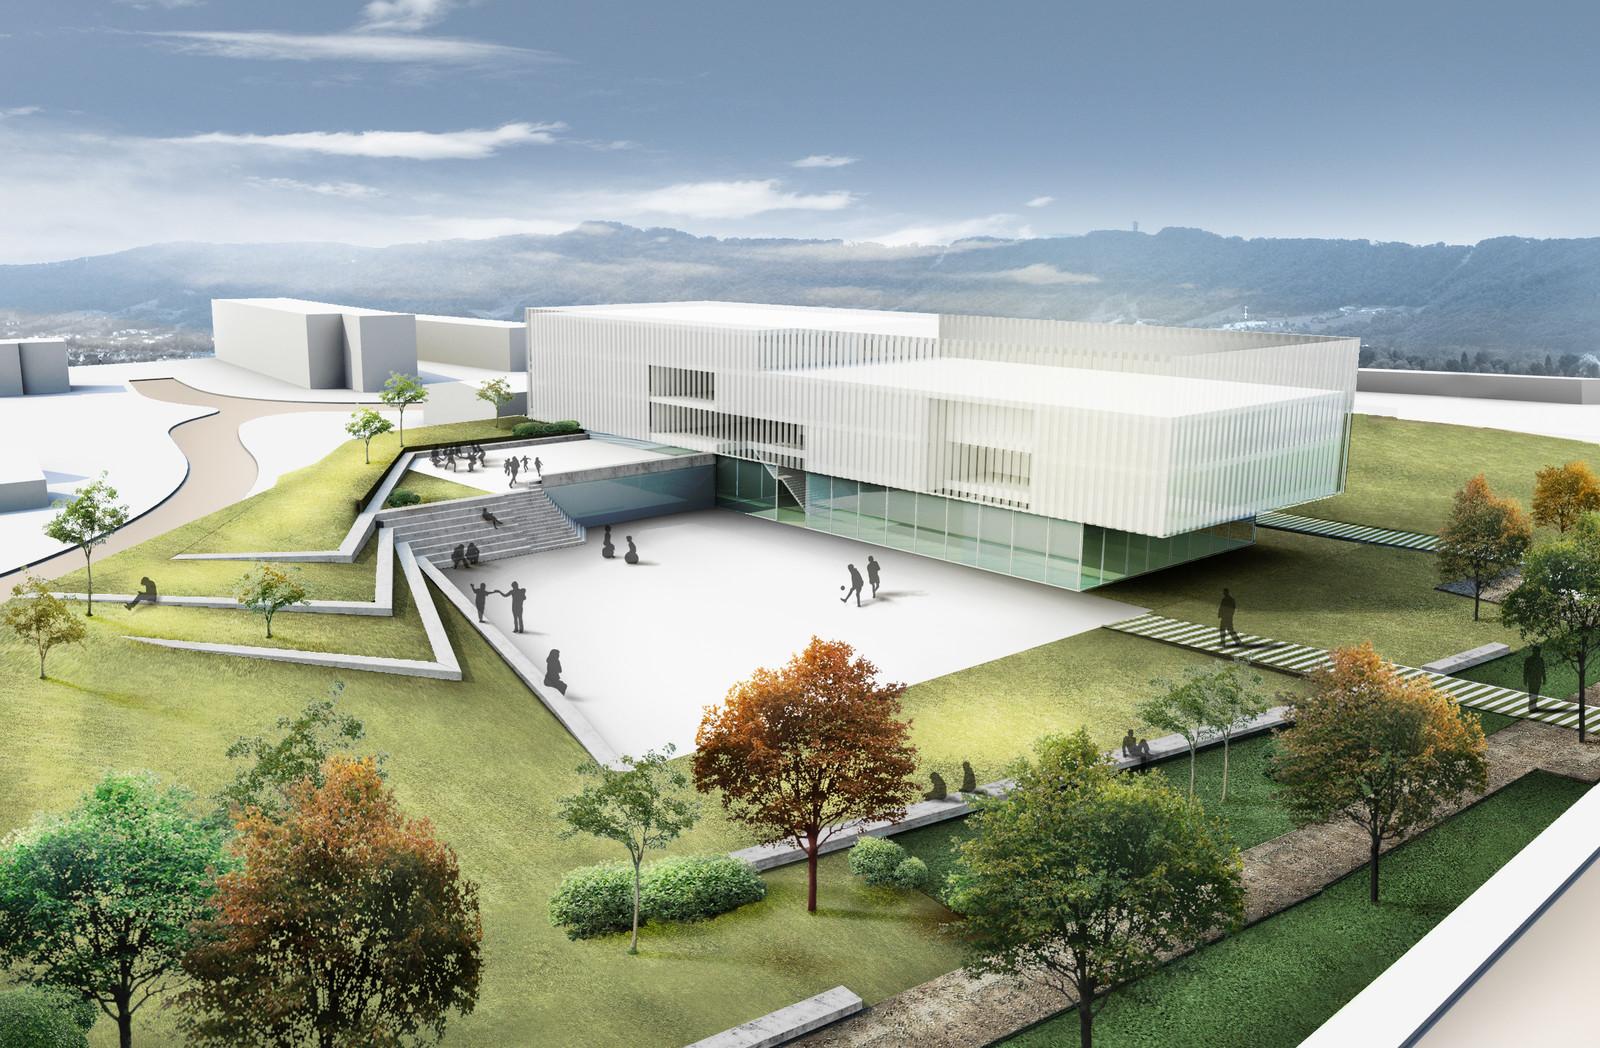 Winterthur school